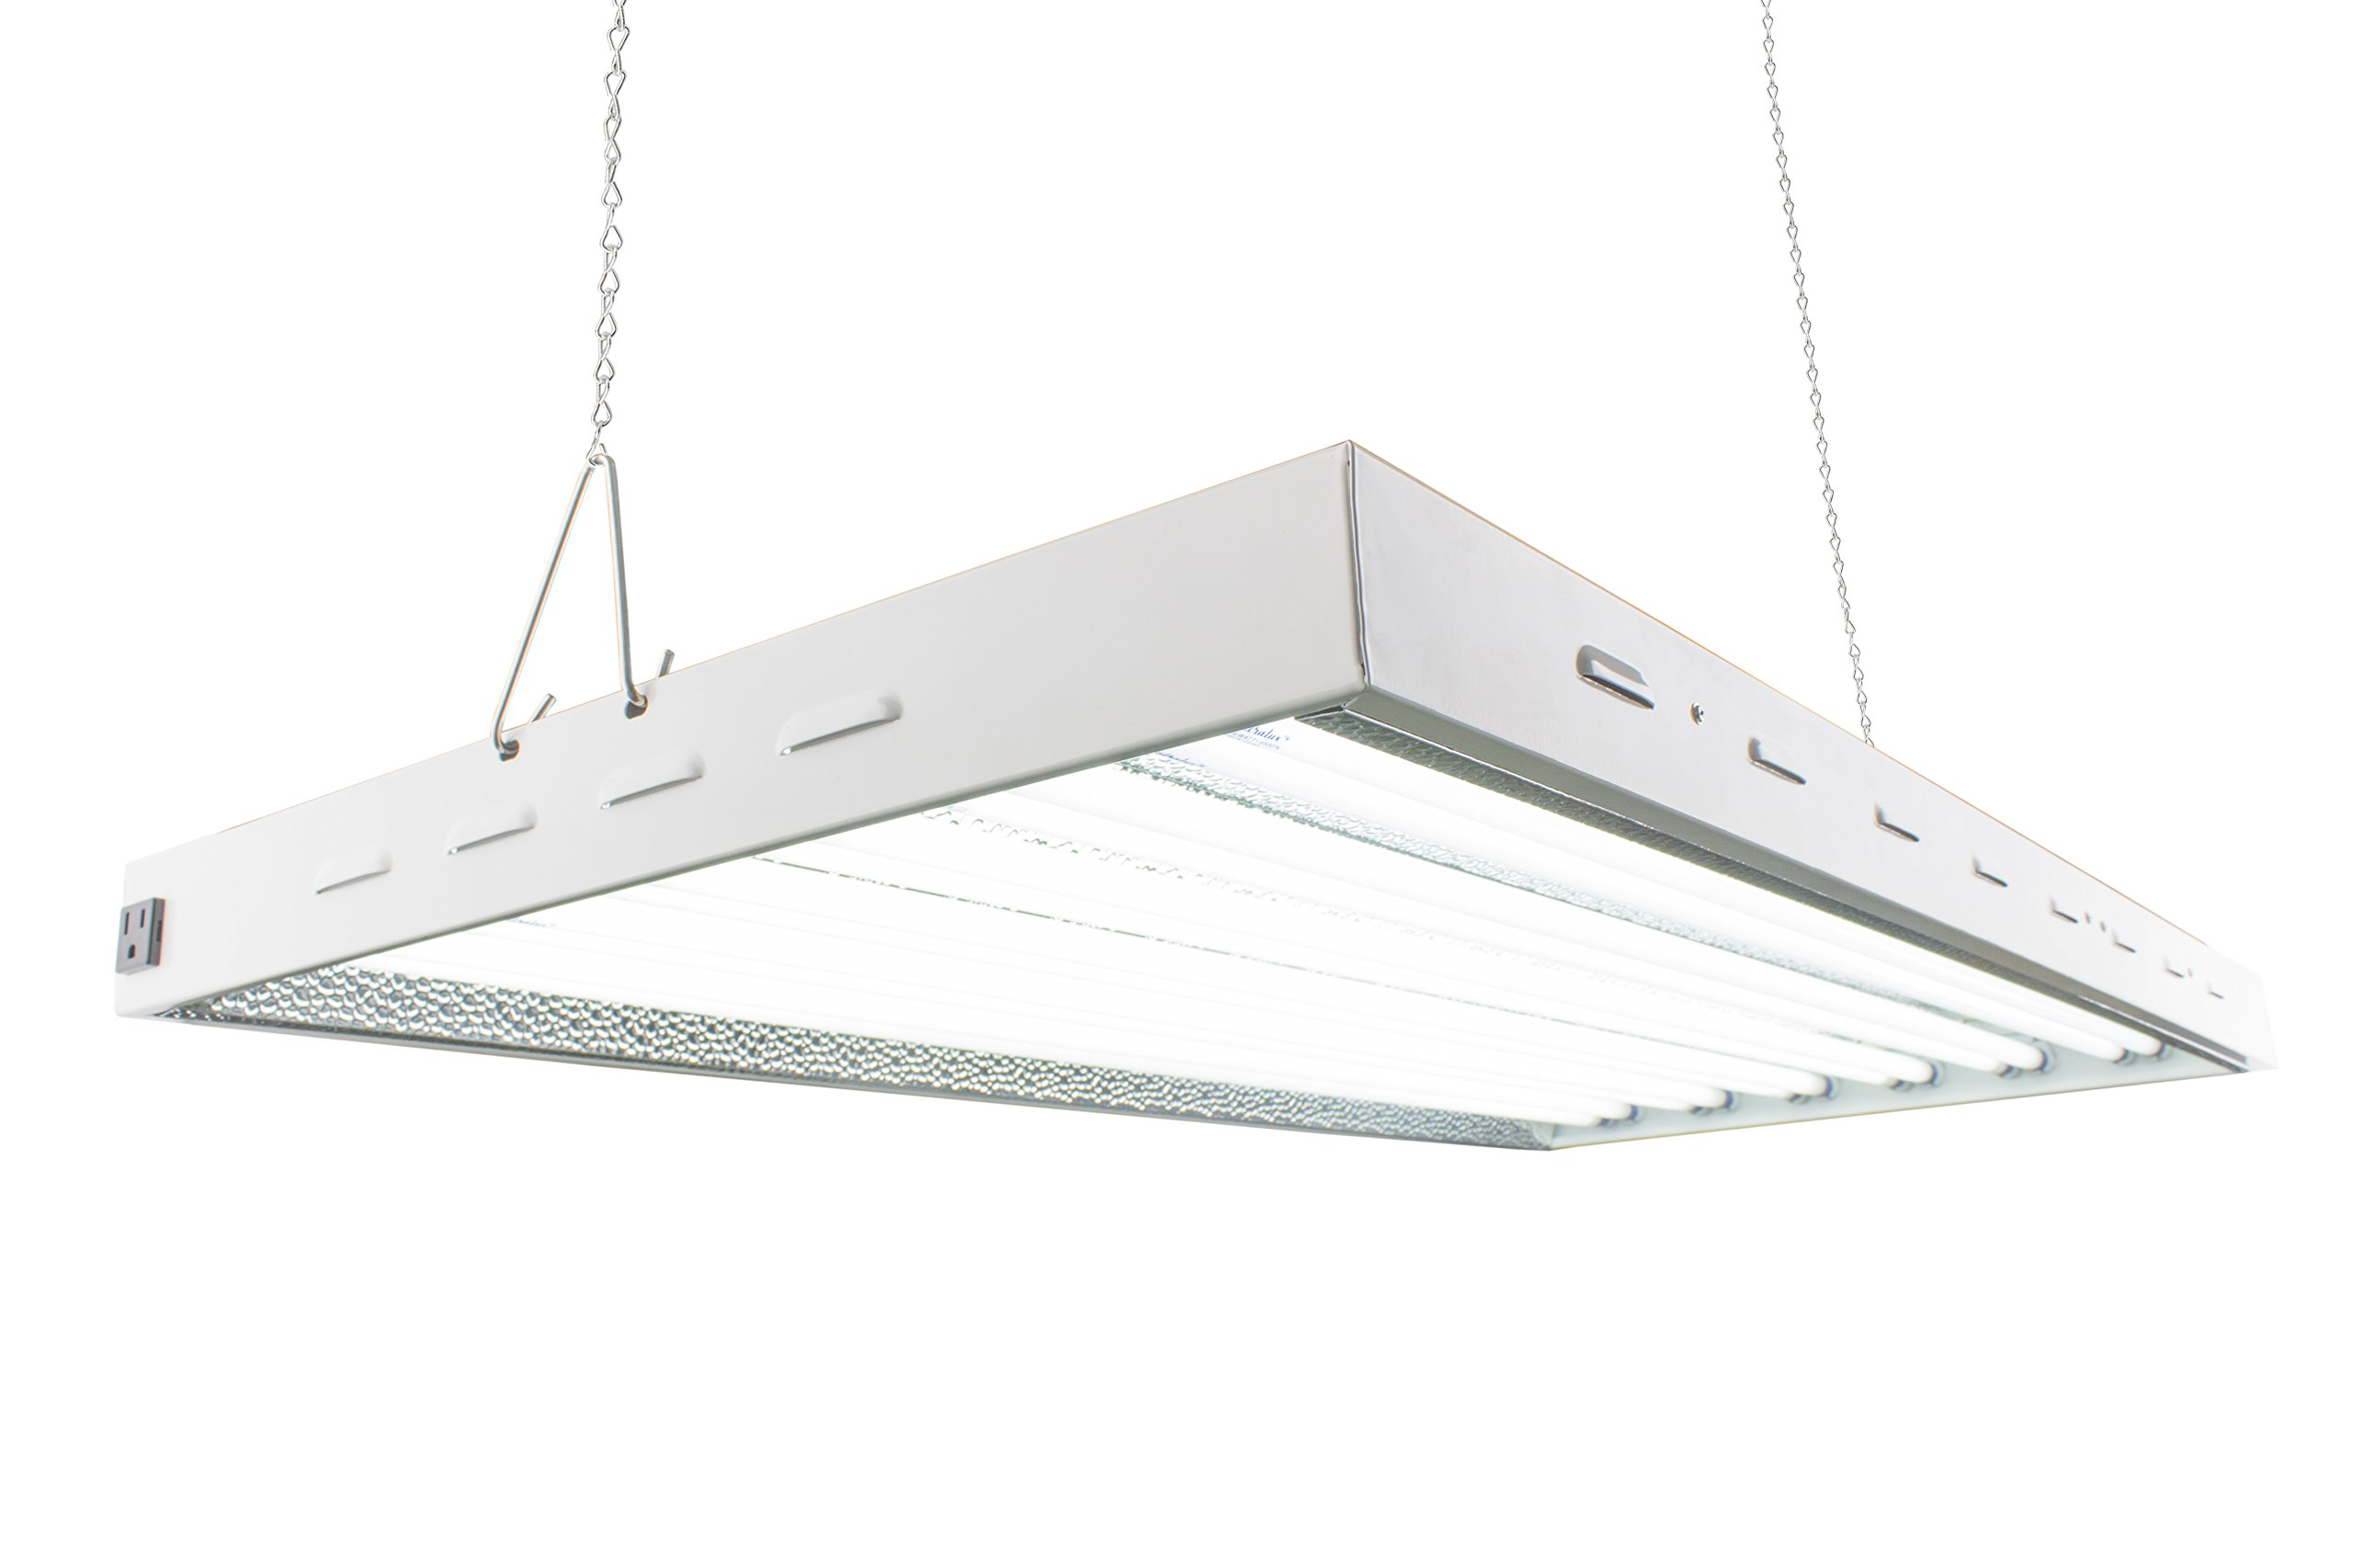 T5 HO Steel Grow Light | 4 FT 12 Lamps | DL8412ST Fluorescent Hydroponic Indoor Fixture | Veg Bulbs